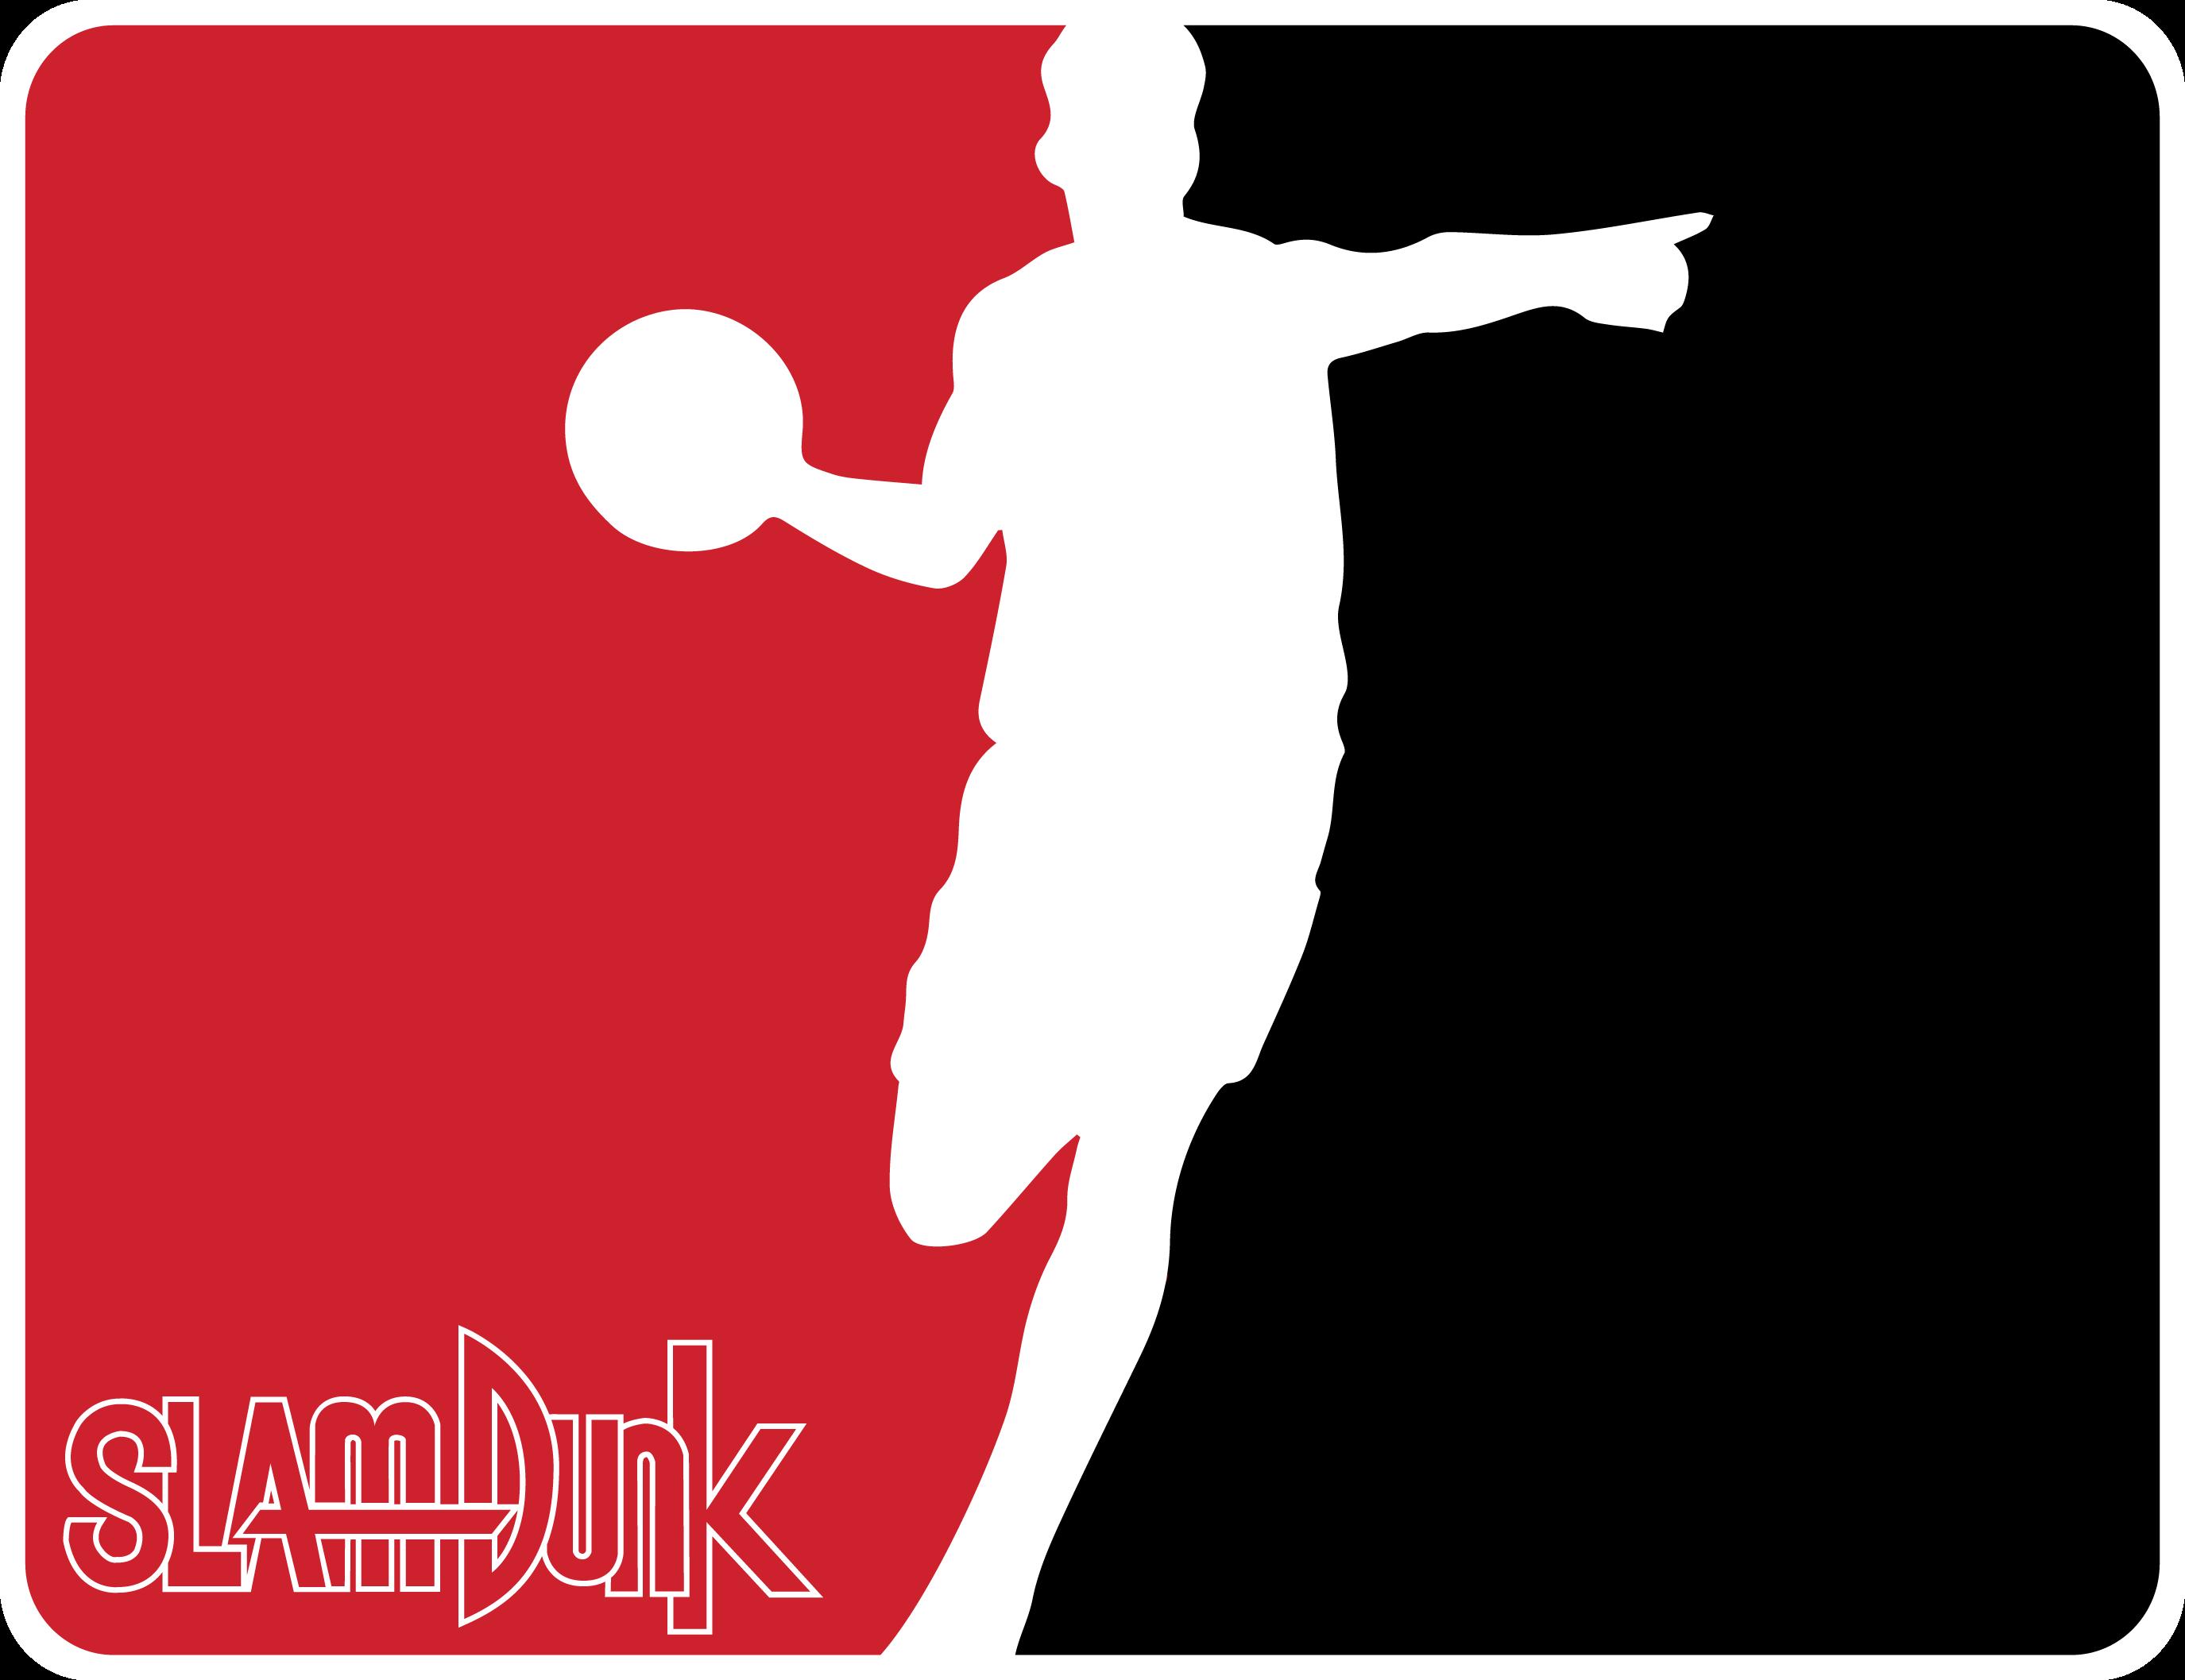 Miyagi Ryota | SLAM DUNK - NBA LOGOS | Pinterest